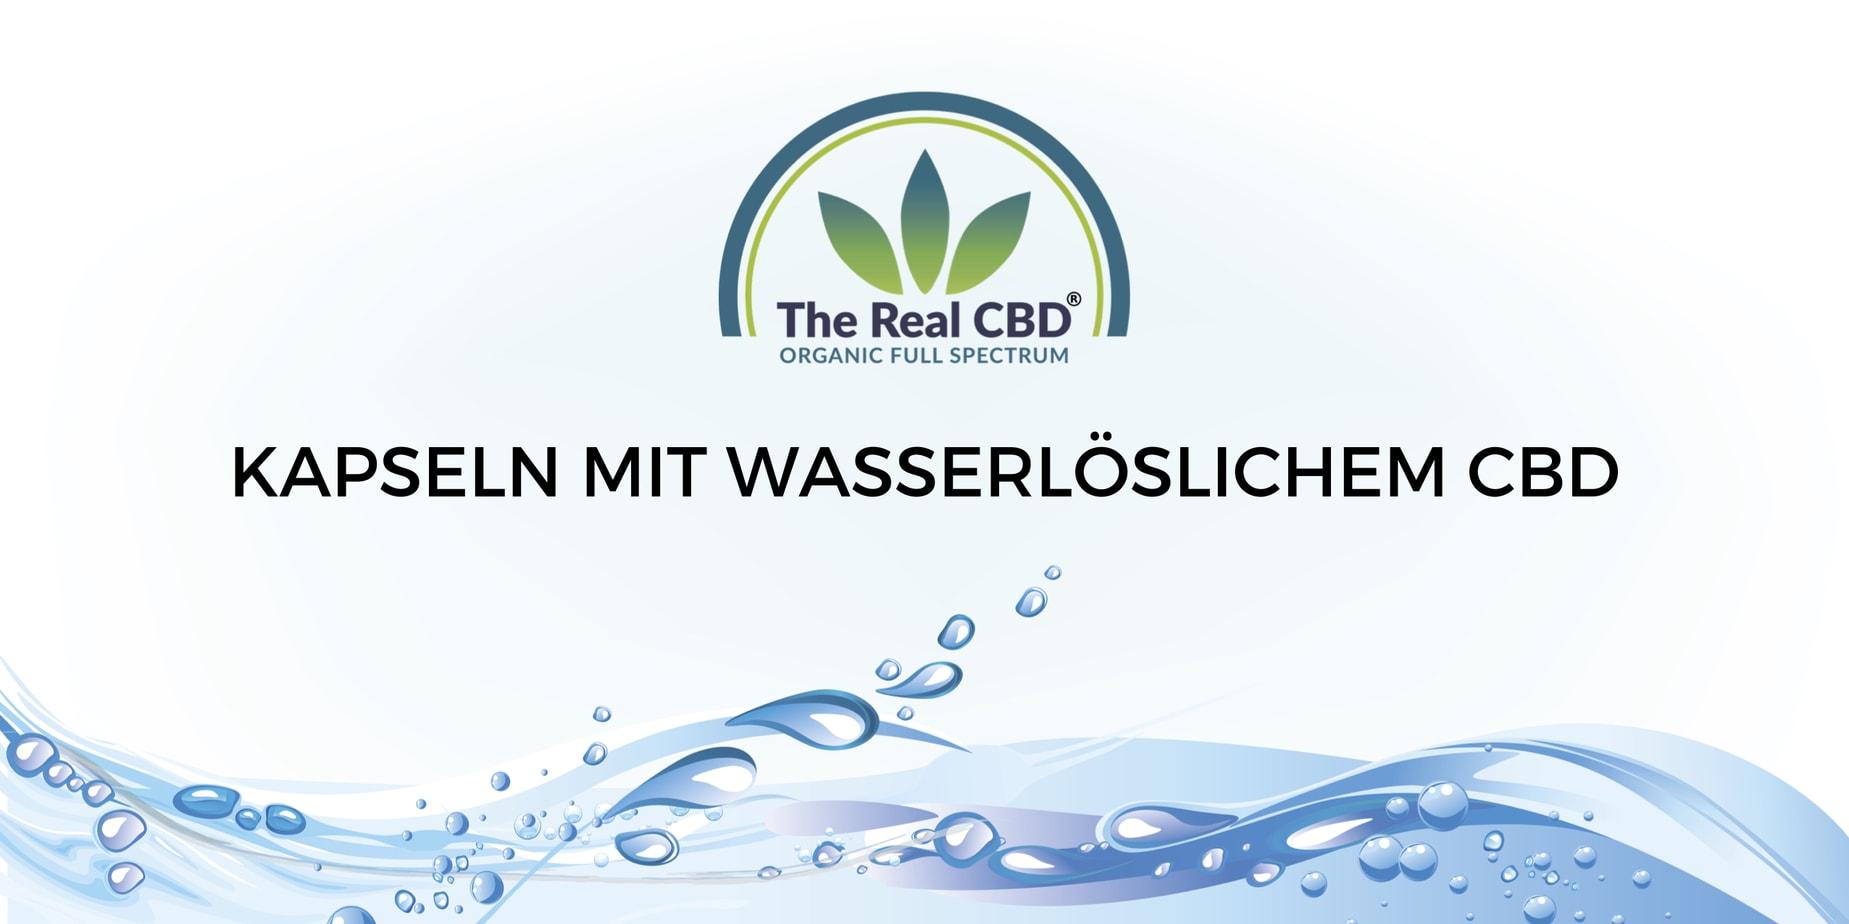 The Real CBD 7,5mg wasserlösliche CBD Kapseln